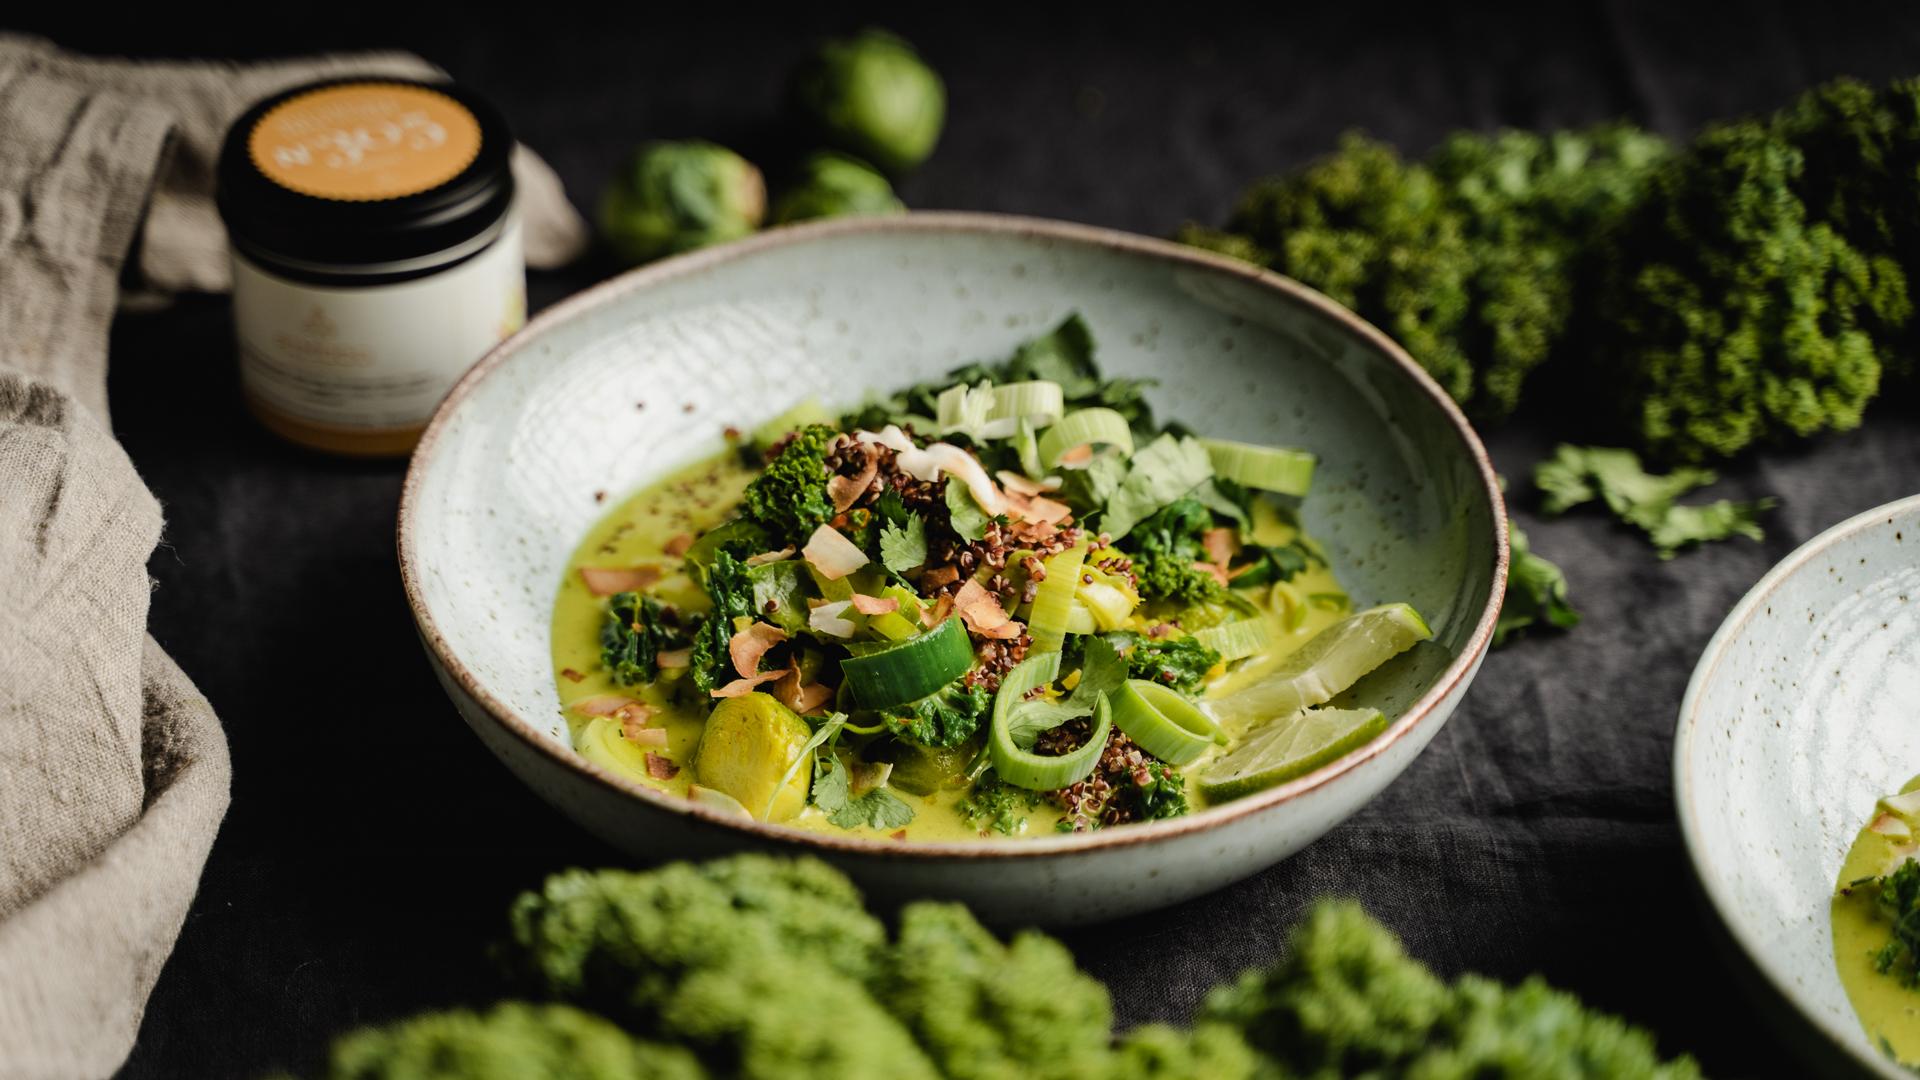 gruenes-thai-curry-rezept-mit-rosenkohl-305-rimoco-gewuerze-16x9